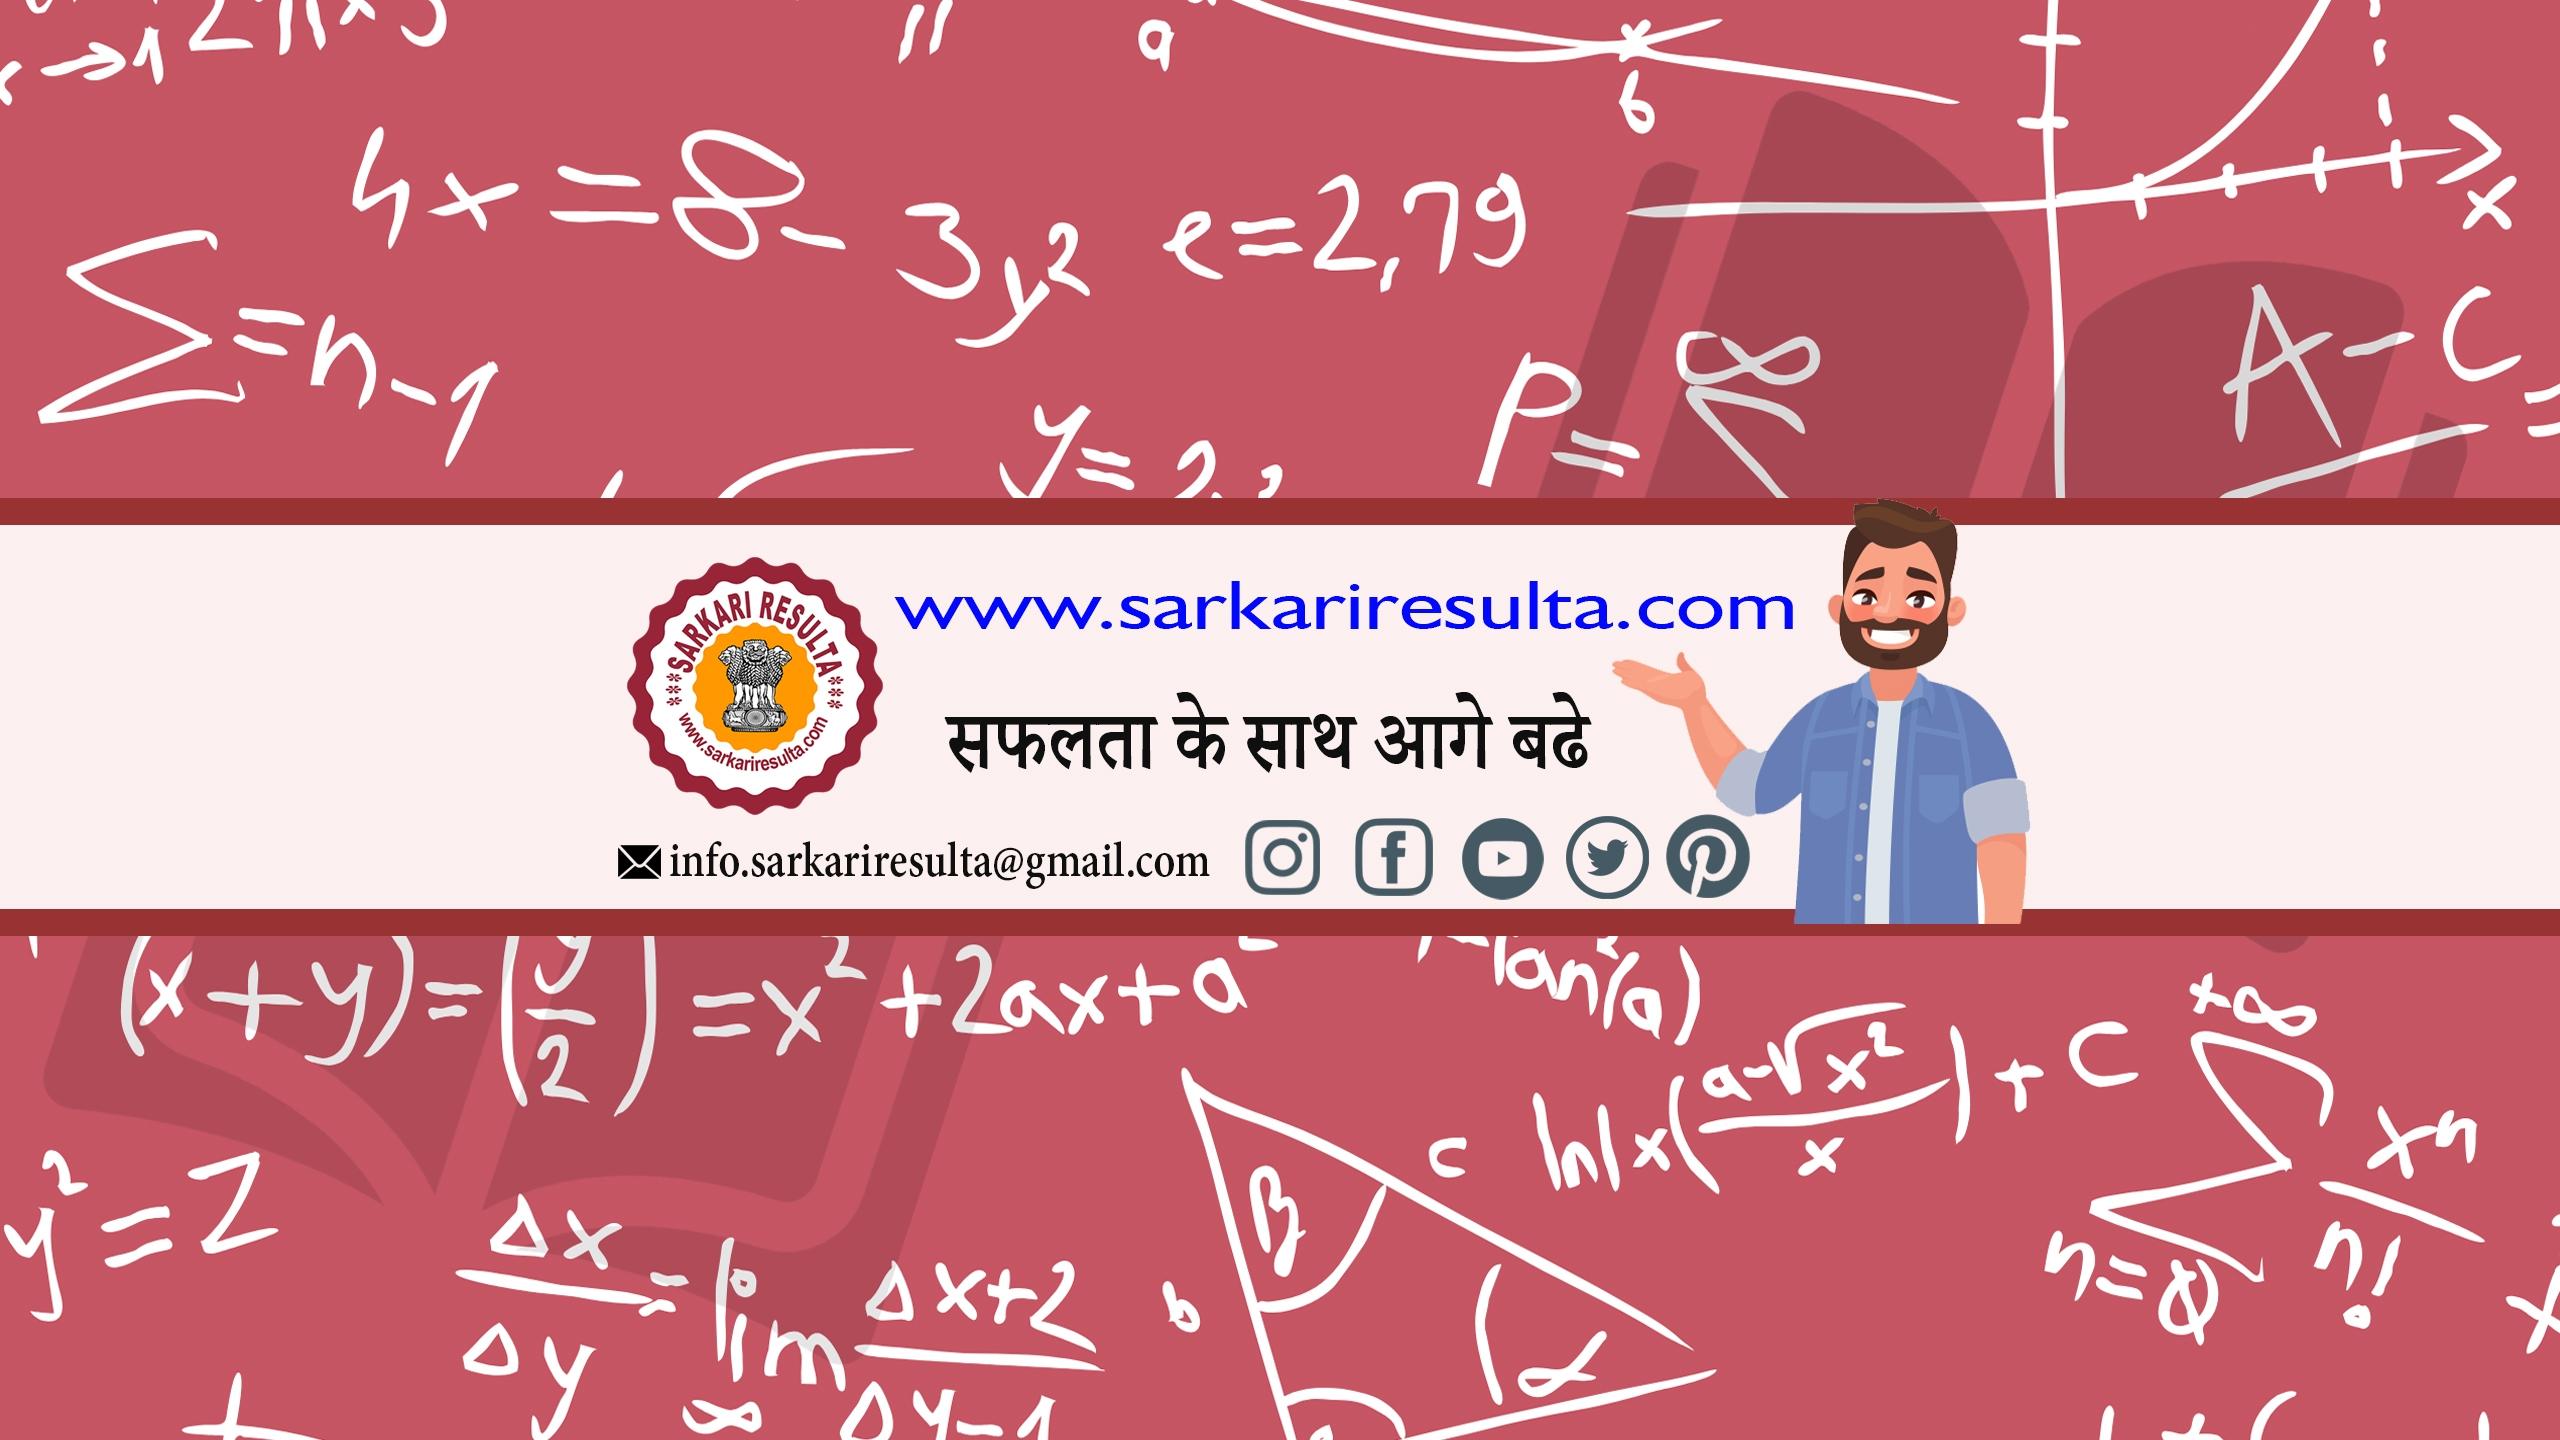 Sarkari Resulta (@sarkariresulta) Cover Image